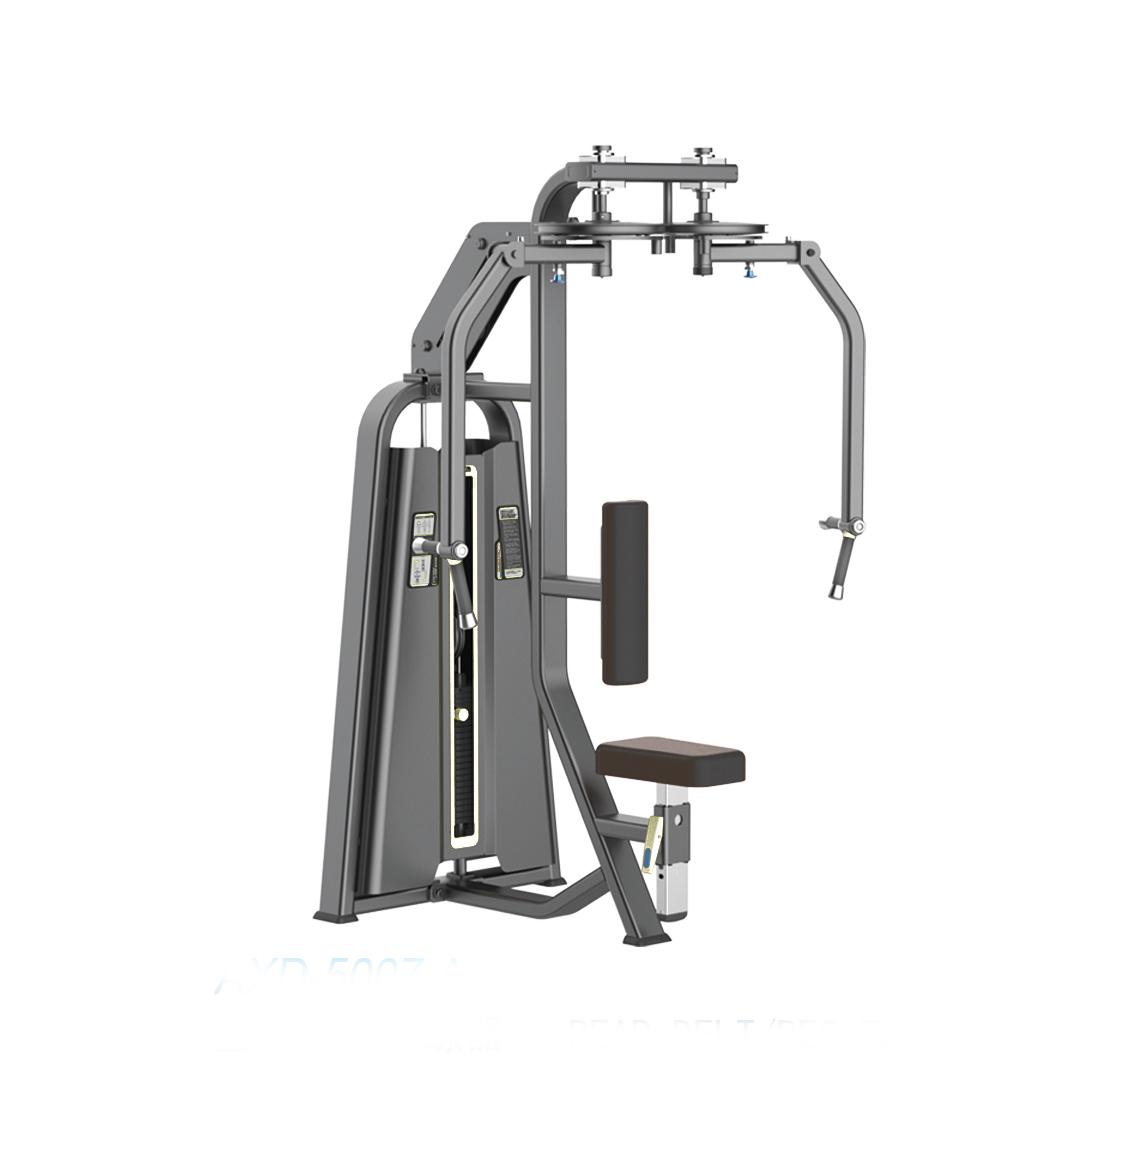 Тренажер GROME Fitness AXD5007A Задние дельты